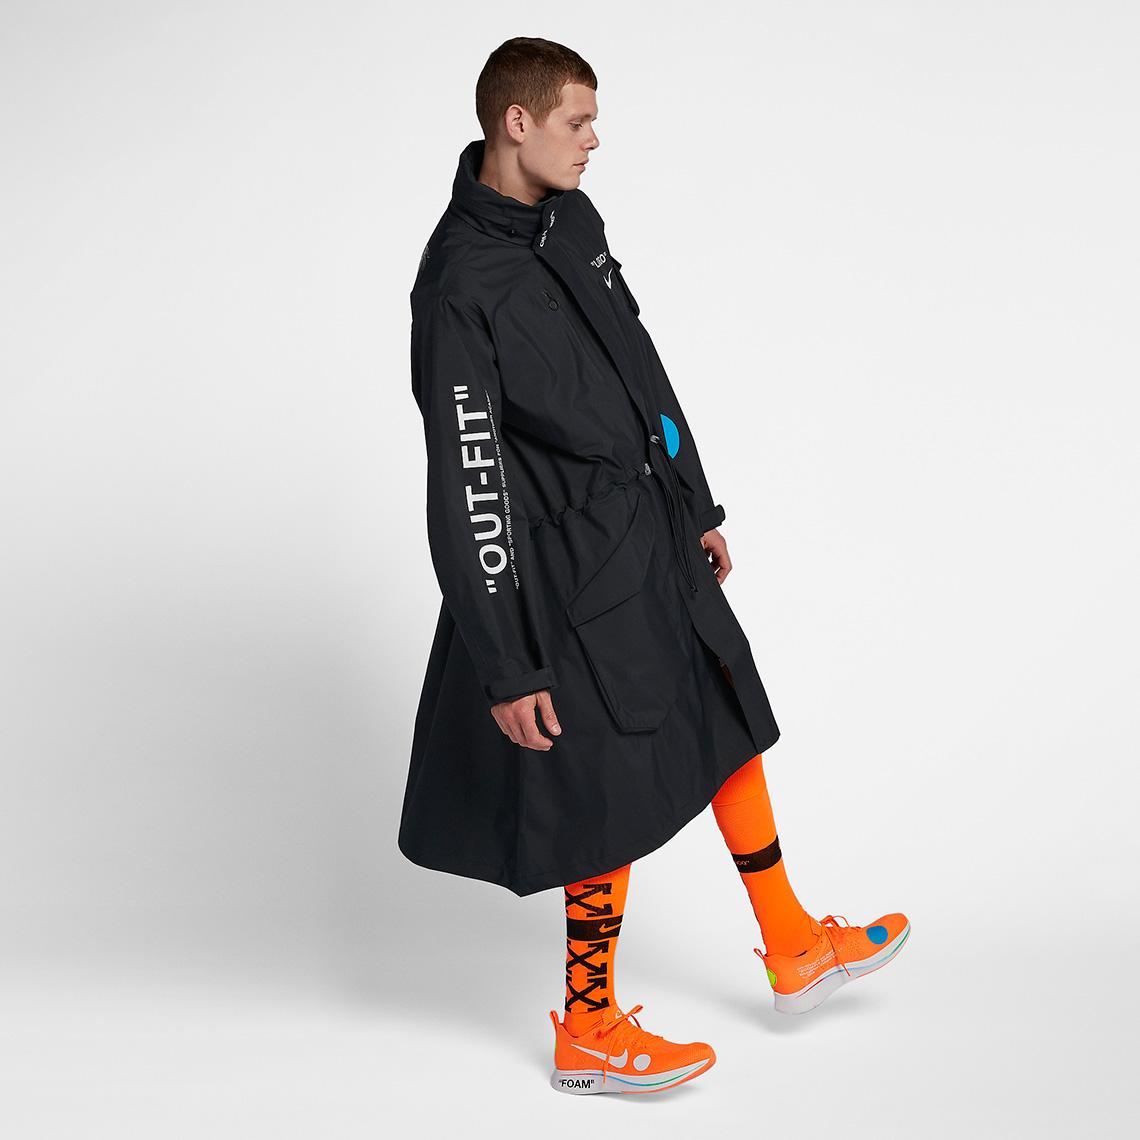 off-white x nike football hoodie